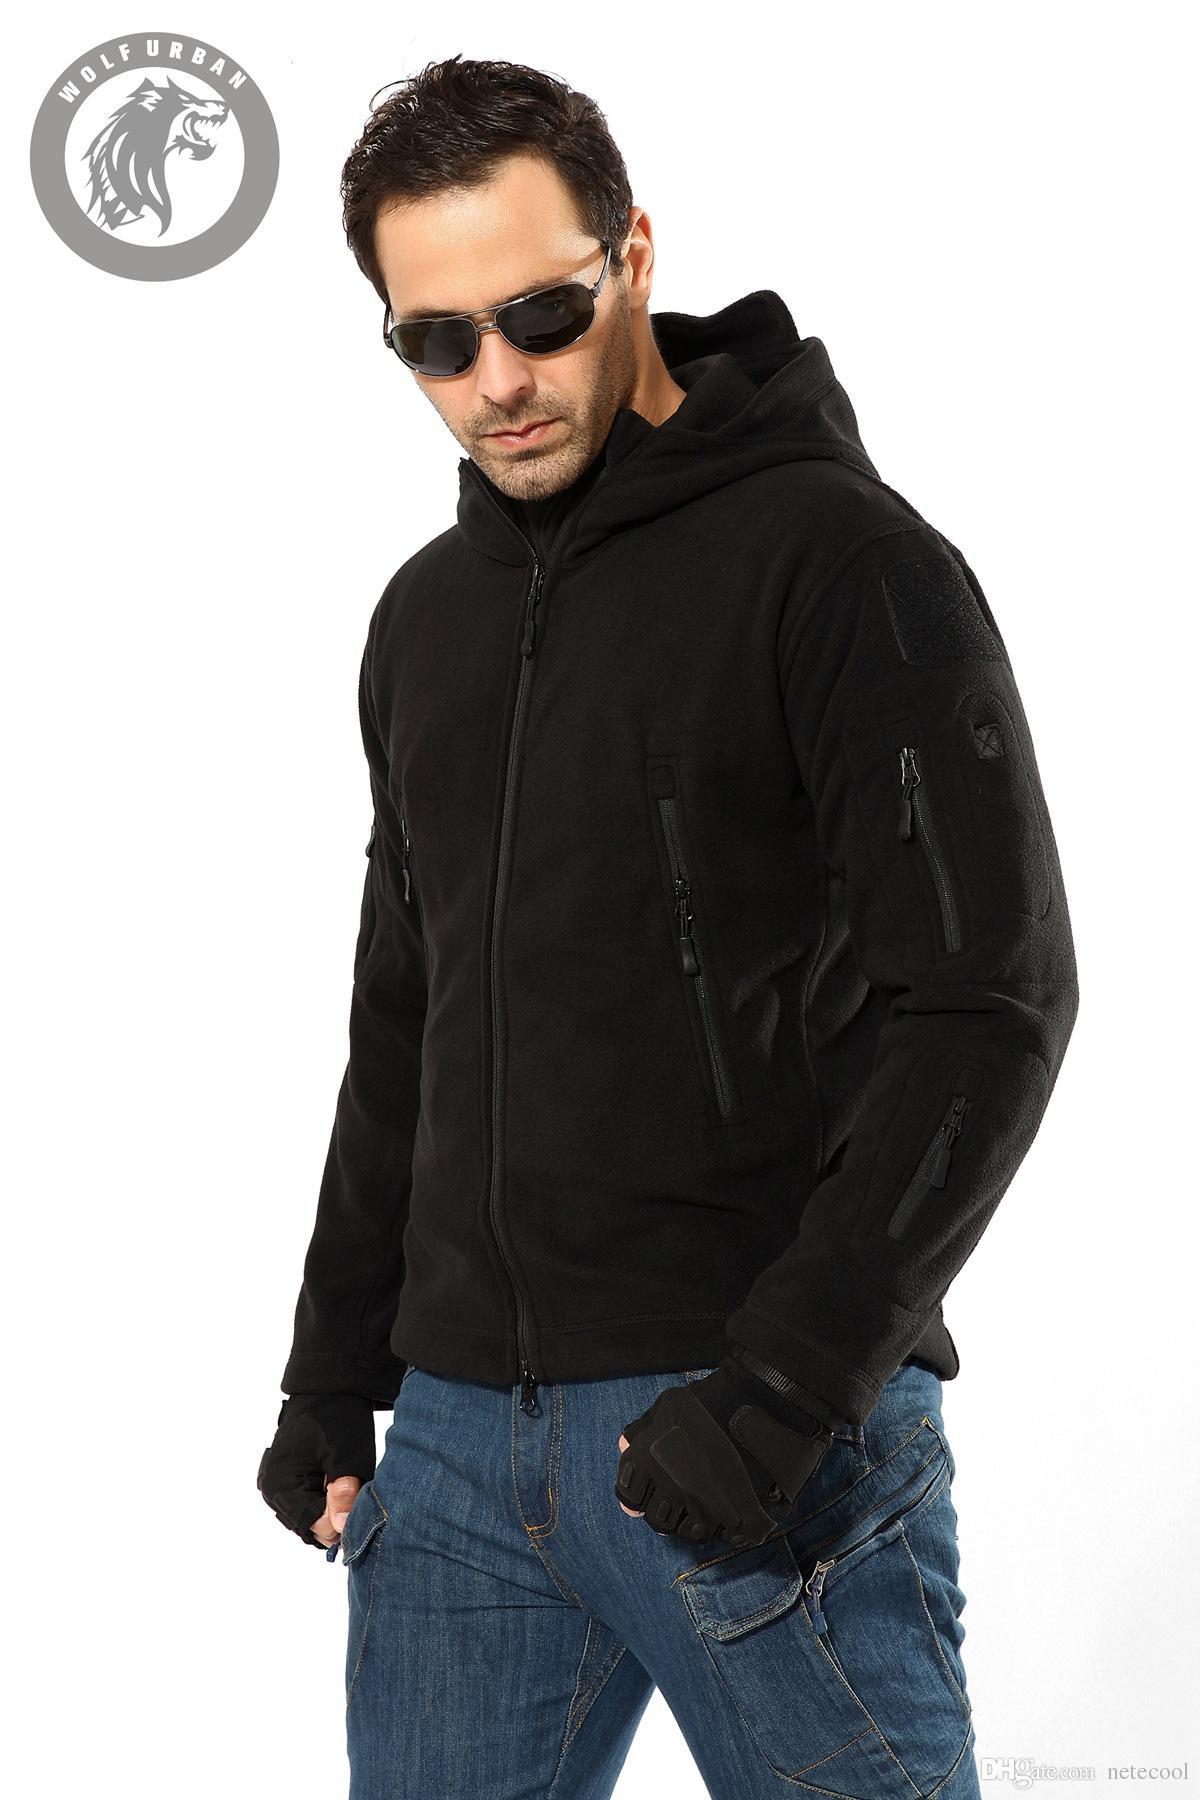 Männer Military Jacke Cool Coat wasserdichte taktische Jacke Winter Softshell Jagd Jacken Army Hooded Windbreaker Multi Reißverschlusstasche